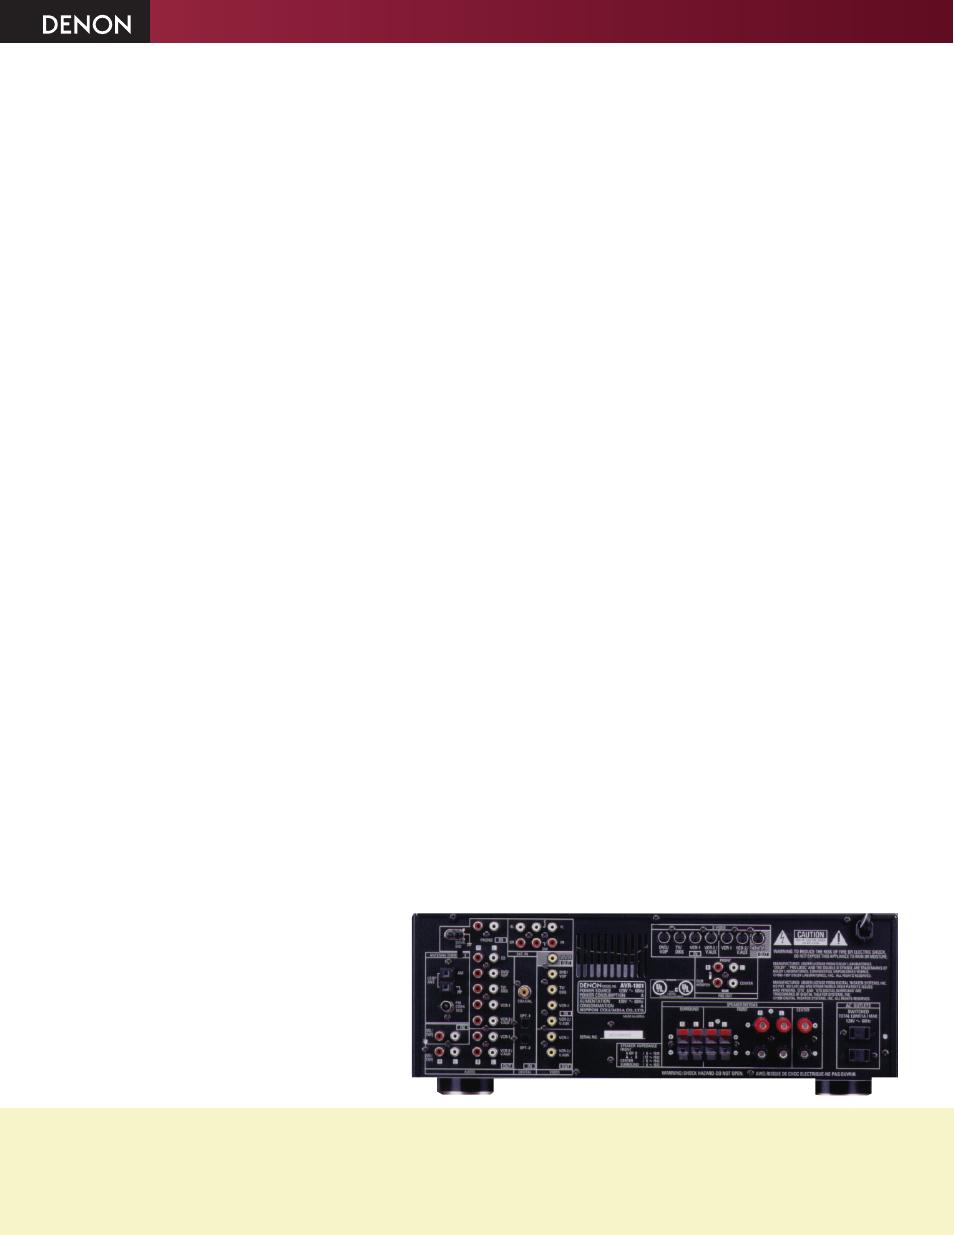 avr 1801 denon avr 1801 user manual page 2 2 original mode rh manualsdir com denon avr 1801 user manual pdf Review Denon AVR 1801